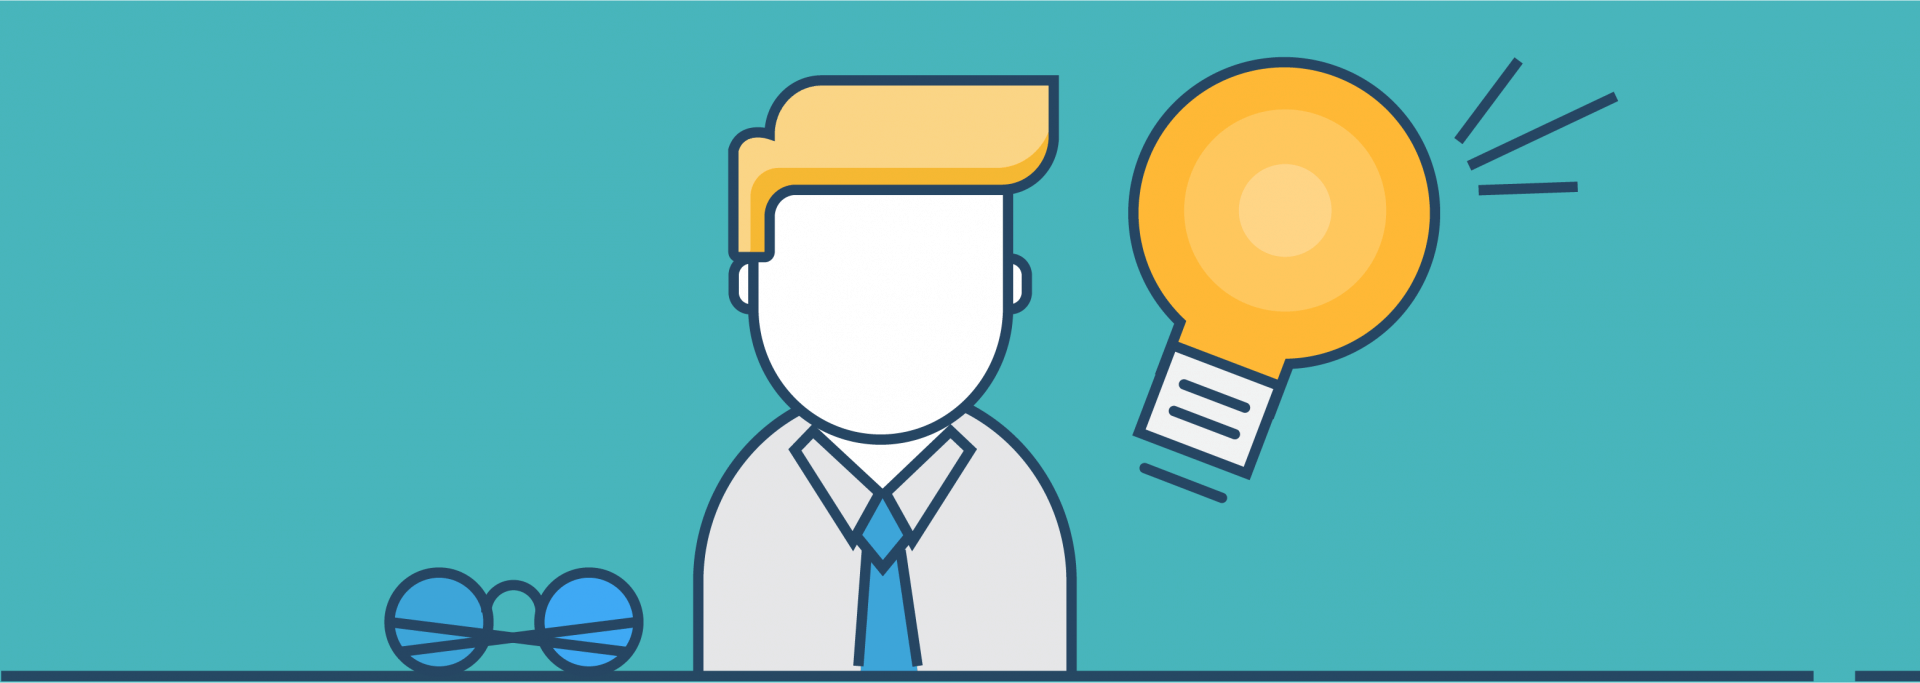 FiP.S Core Values Bilder Wissen: Glühbirne